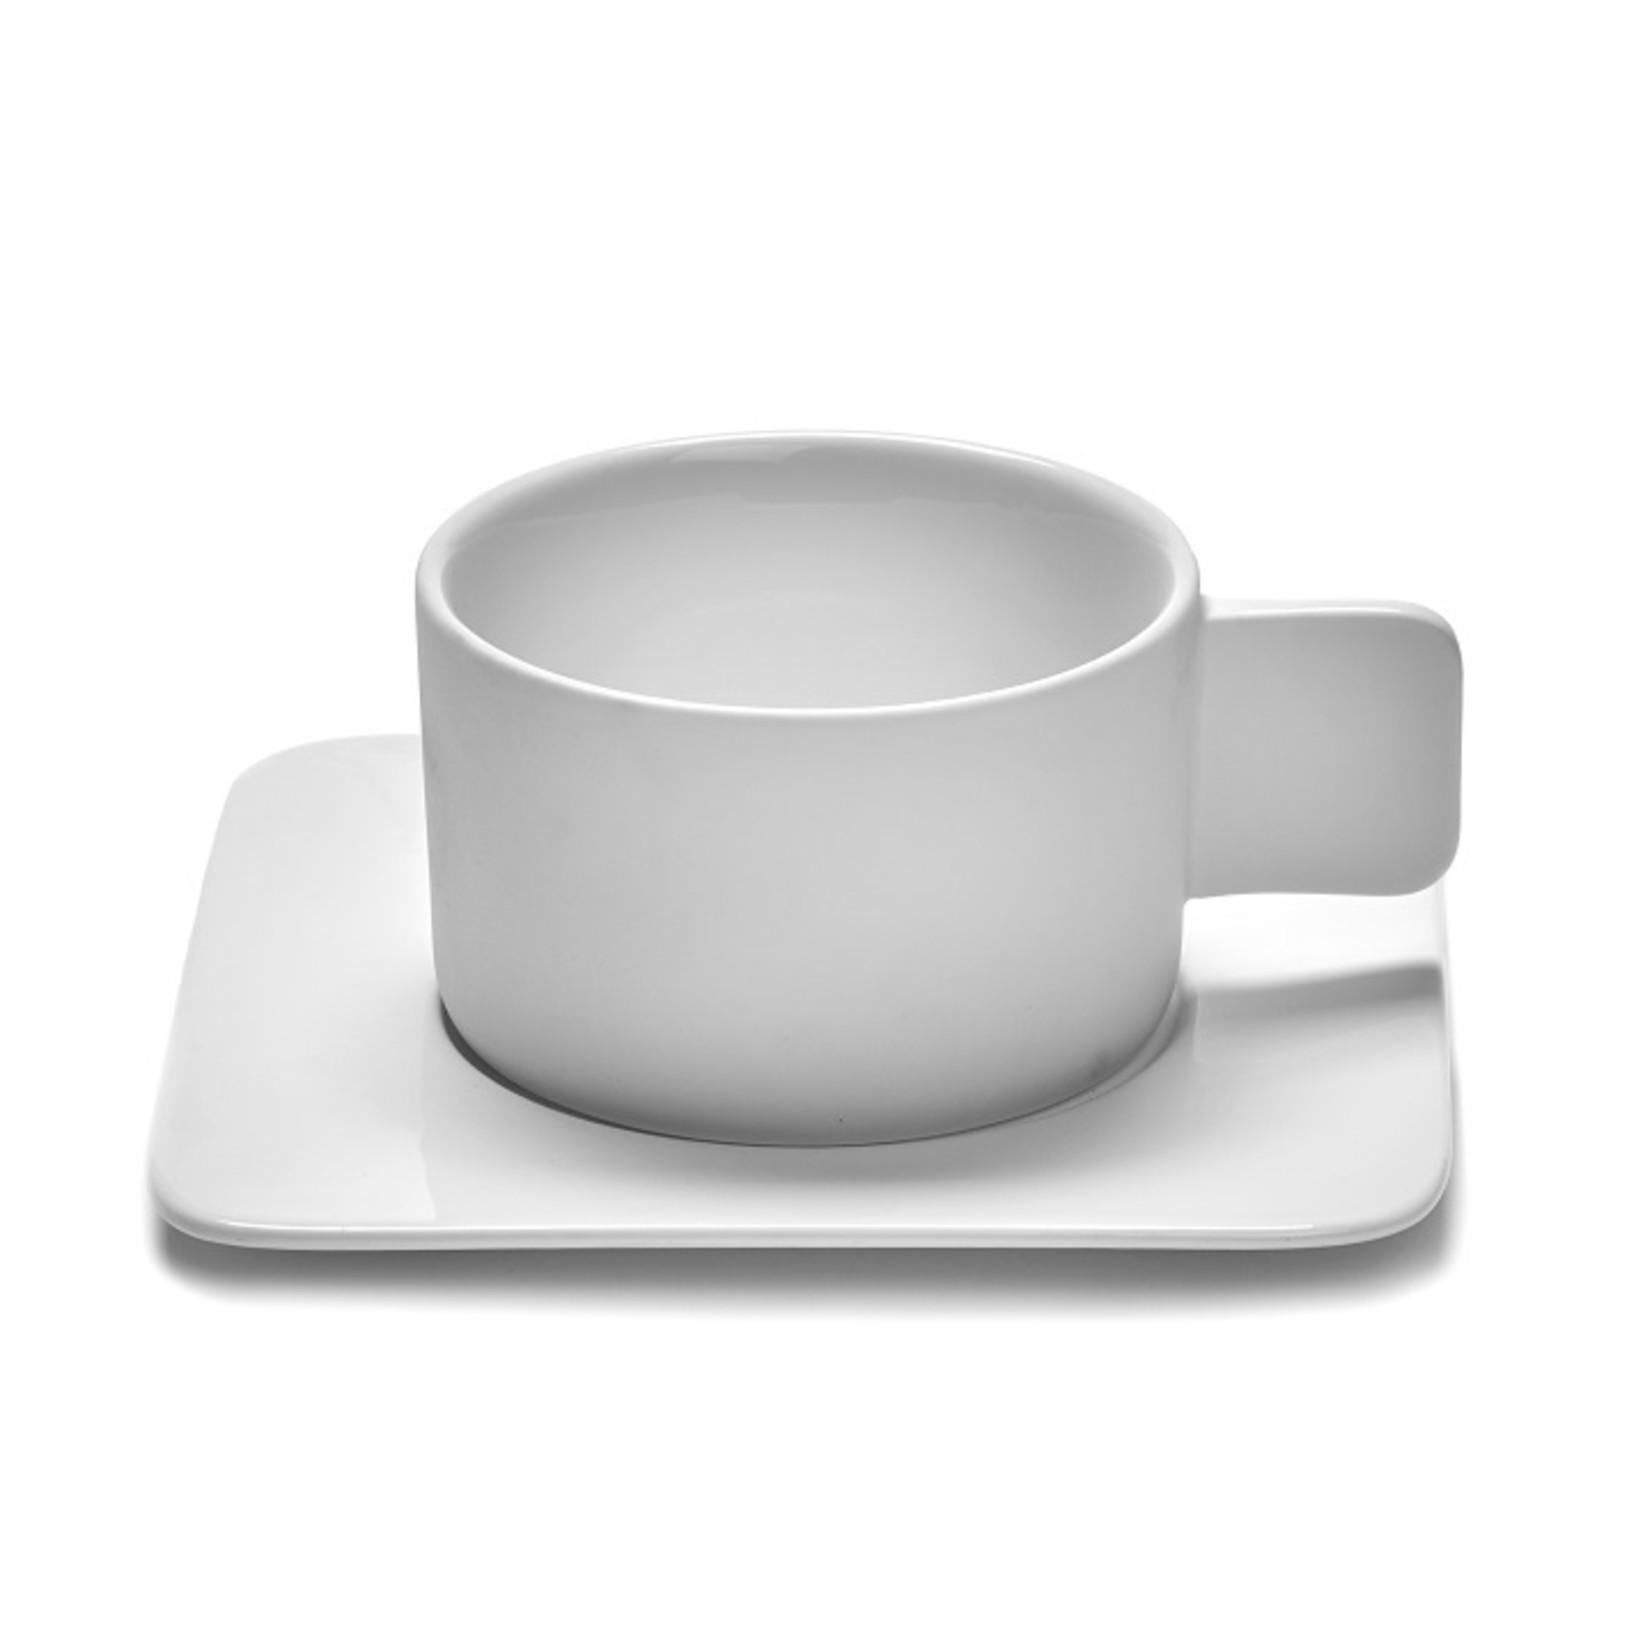 SERAX SAUCER CAPPUCCINO CUP HEII